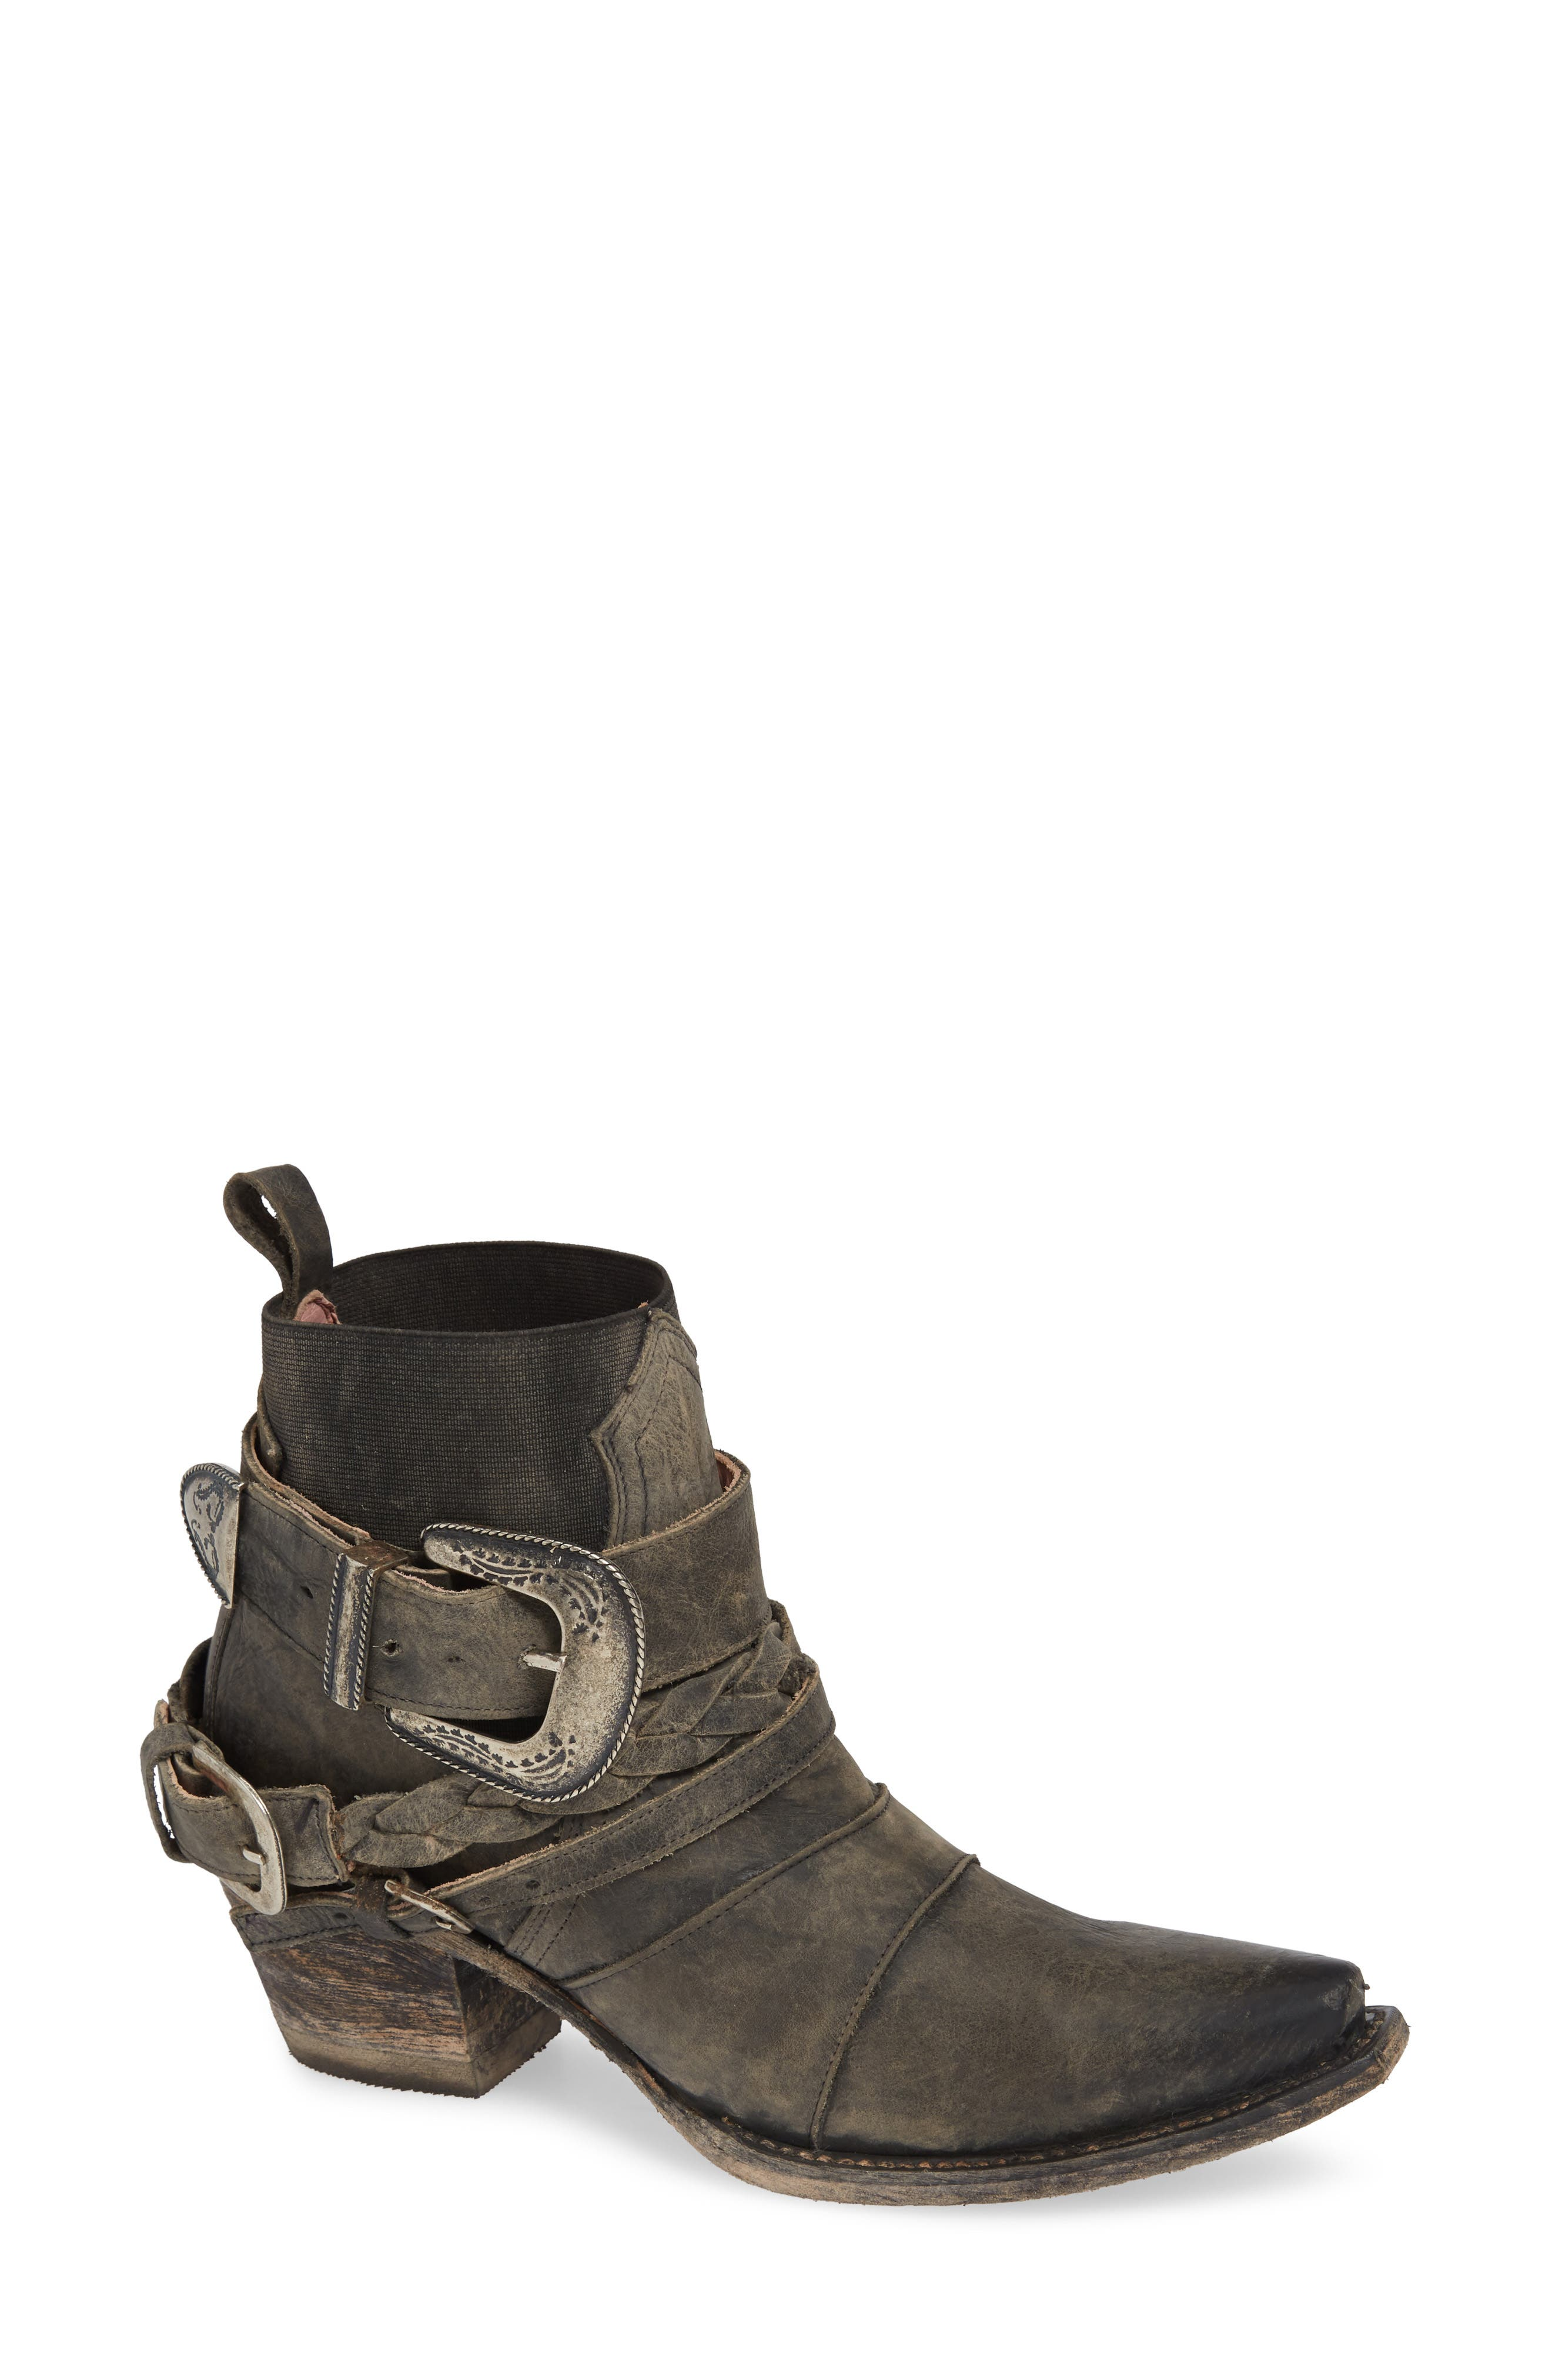 Lane Boots X Junk Gypsy Hwy 237 Bootie, Black